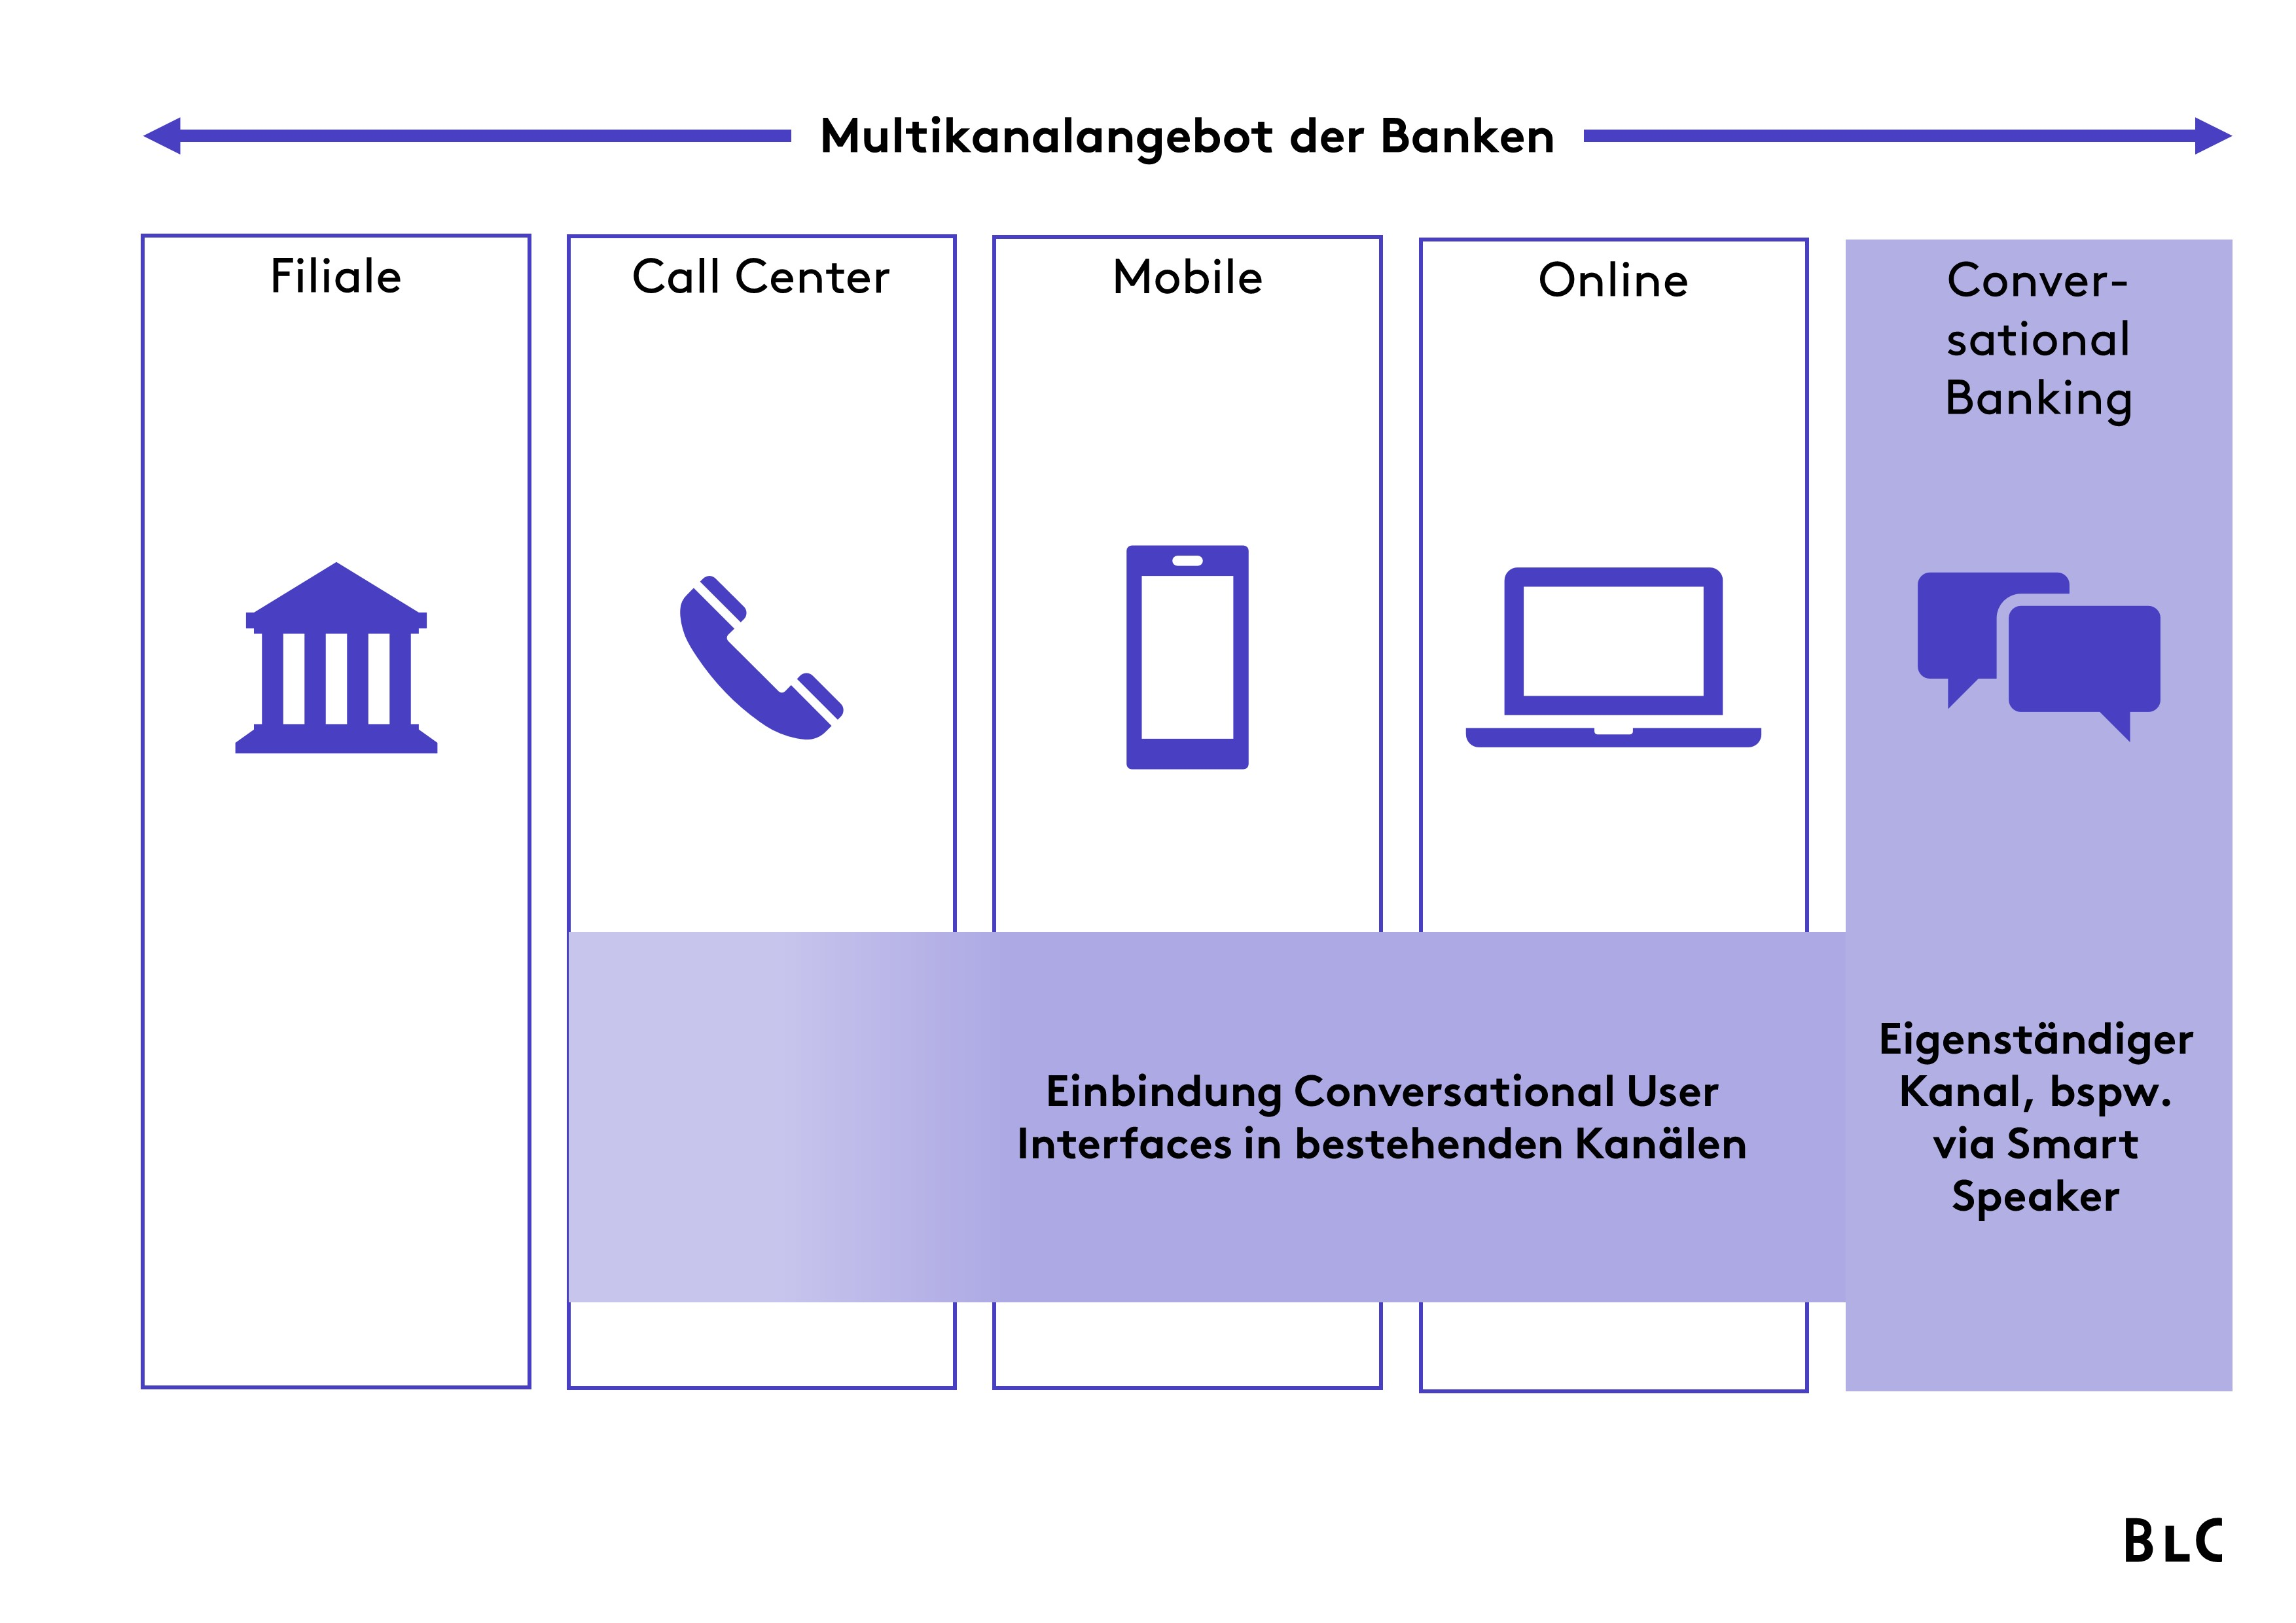 Multikanalangebot der Banken